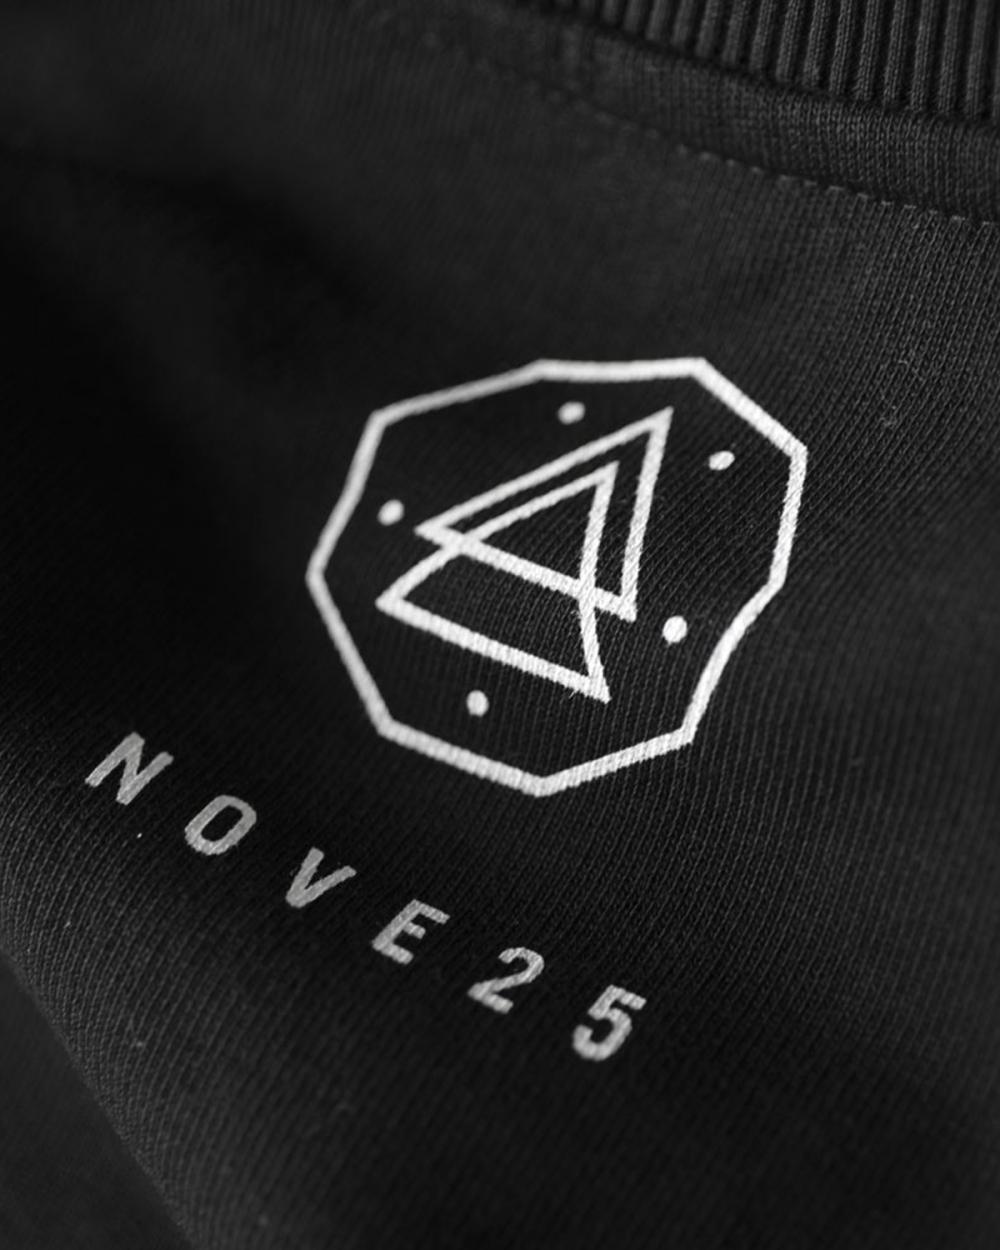 Abbigliamento FELPA LOGO NOVE25 NOVE25